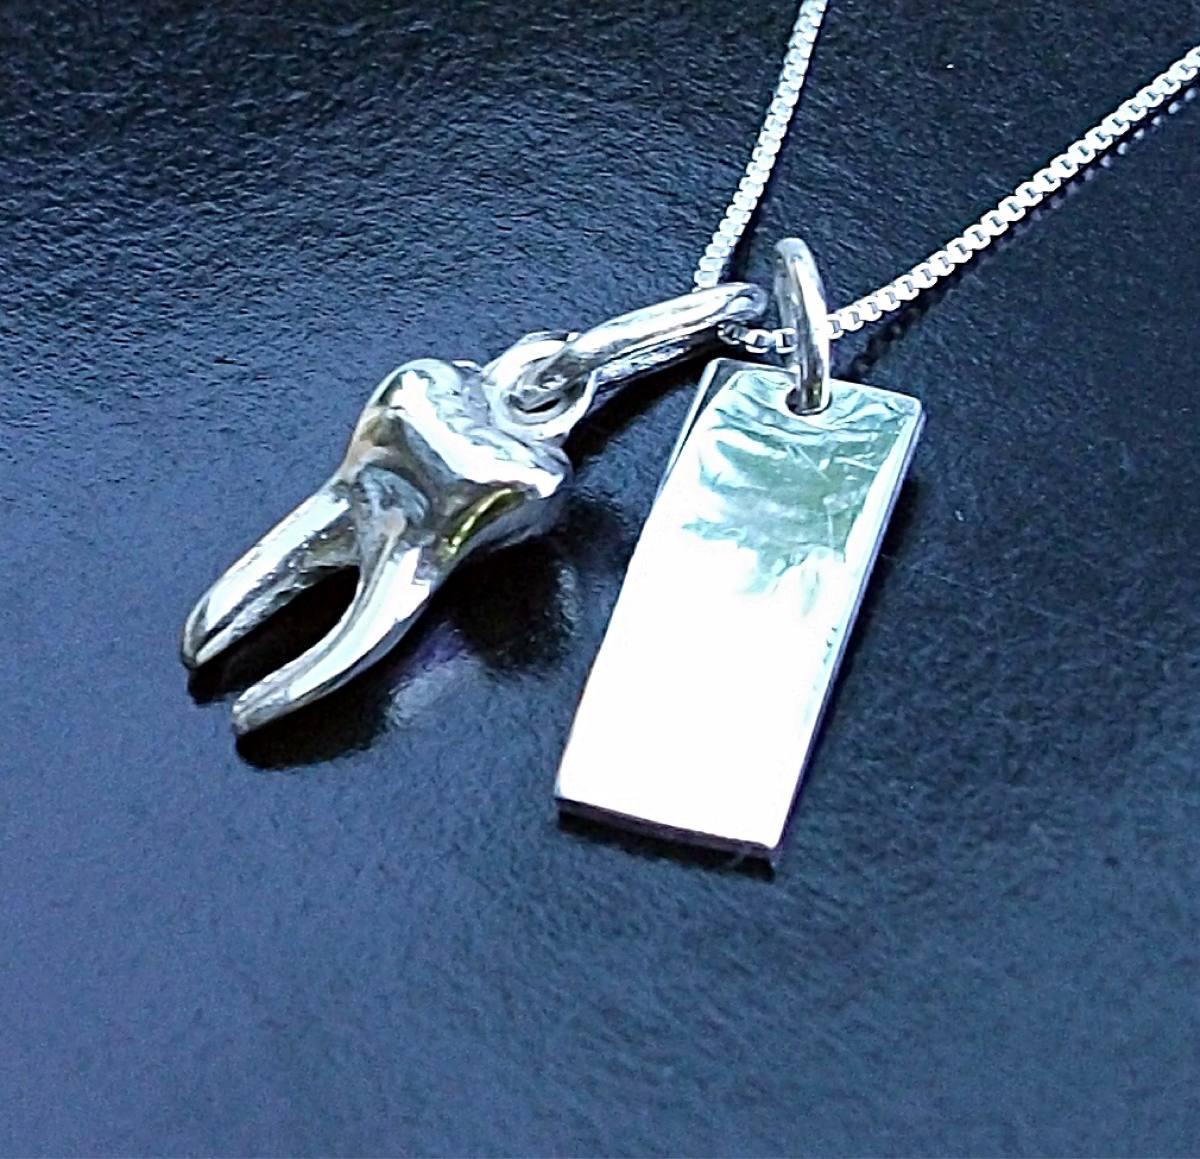 c727a81a604b cadena + dije muela mini + placa personalizada plata ley. Cargando zoom.